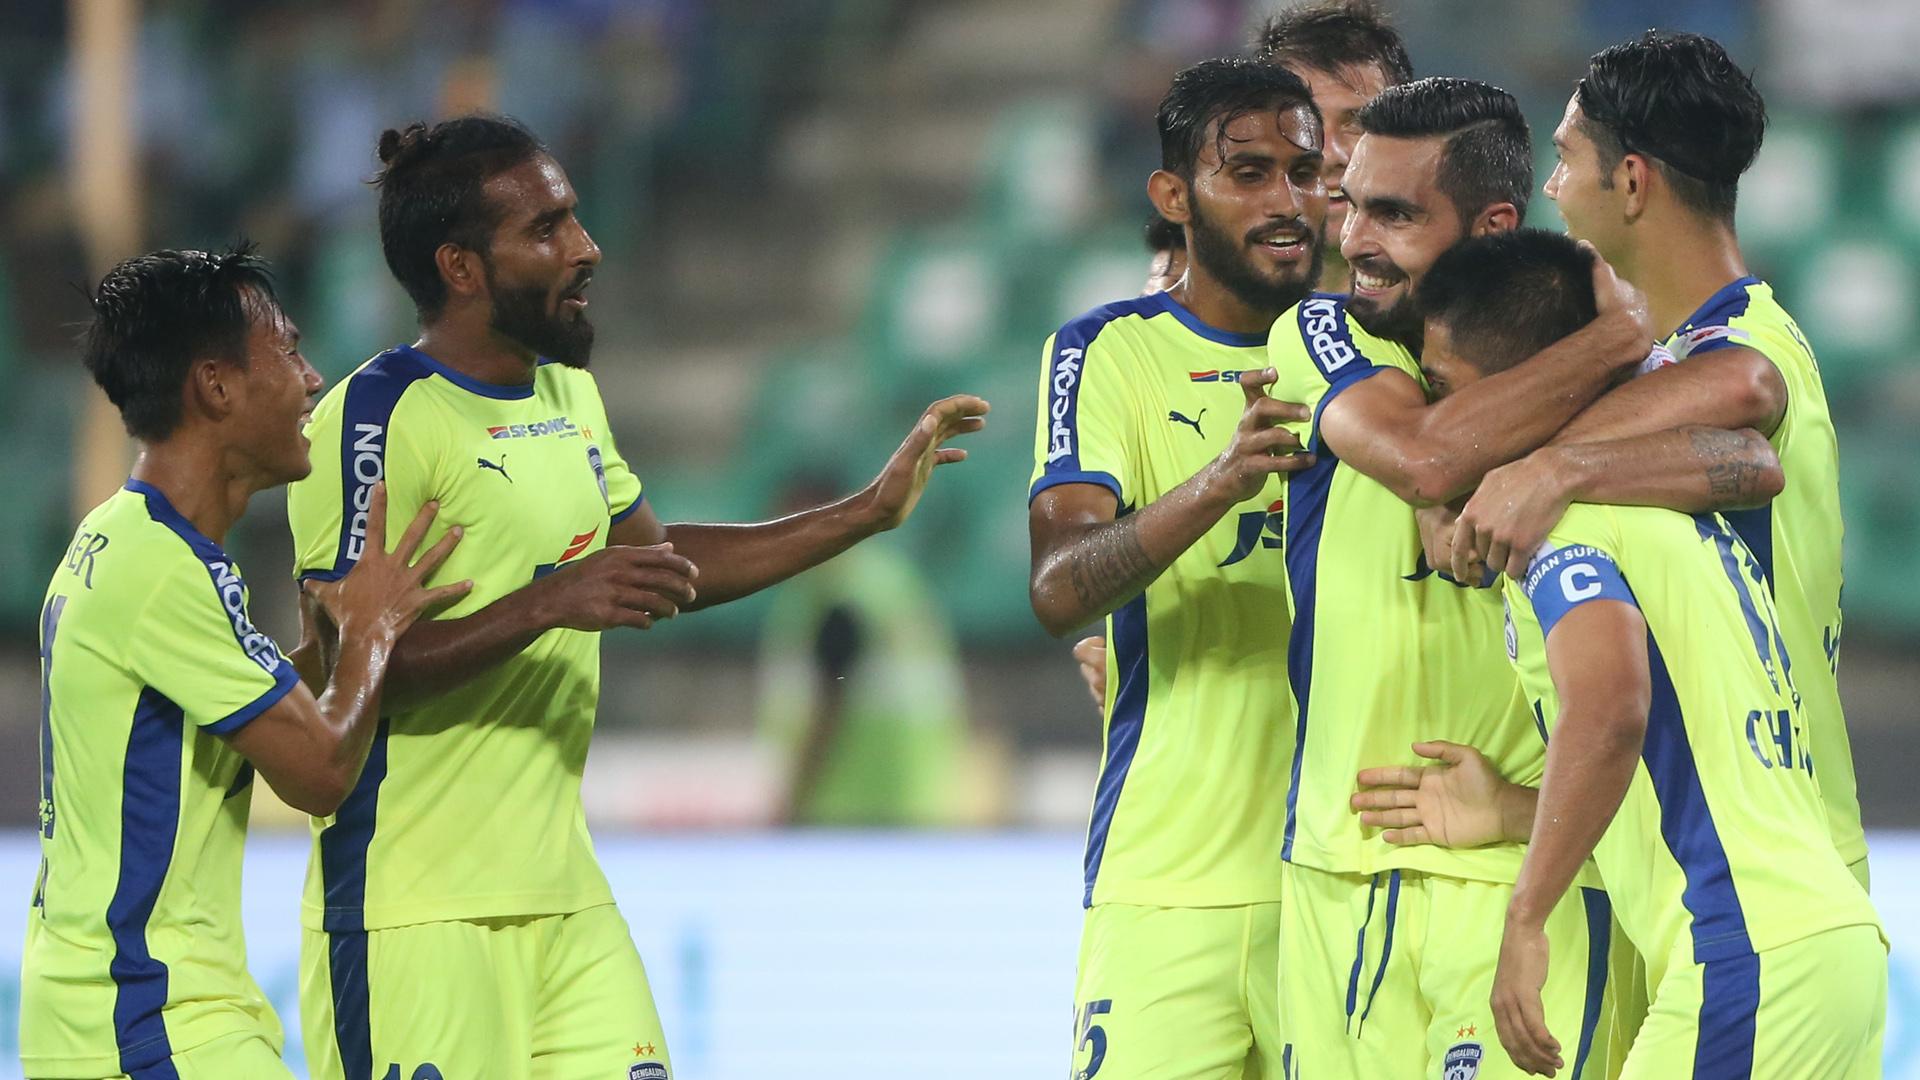 Chennaiyin FC Bengaluru FC ISL 4 2017/2018